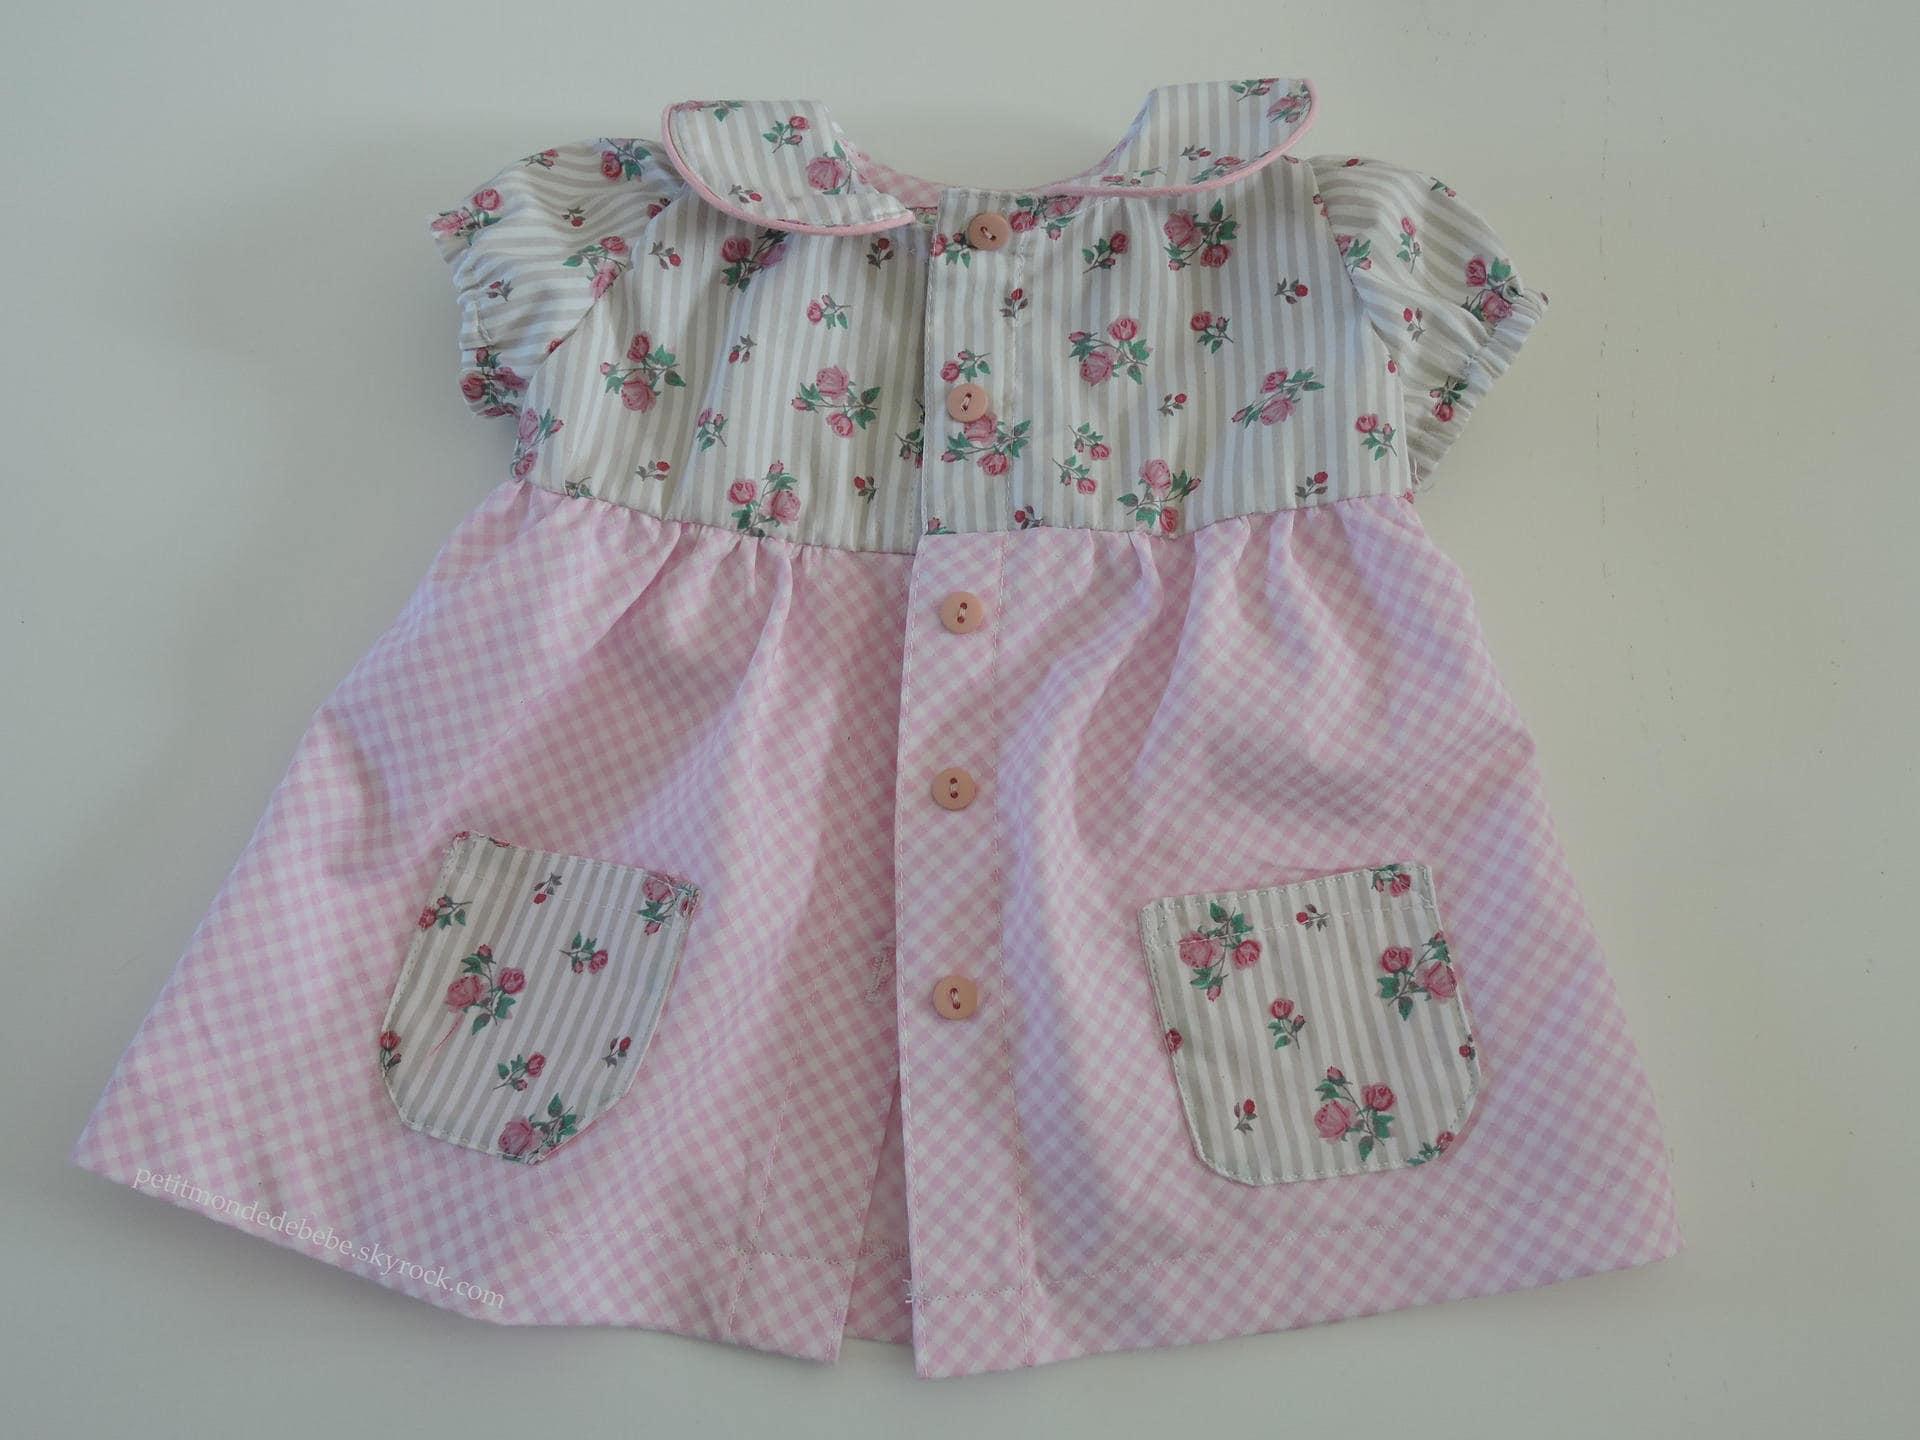 Baby summer dress fabric & floral fabric gingham Peter Pan collar